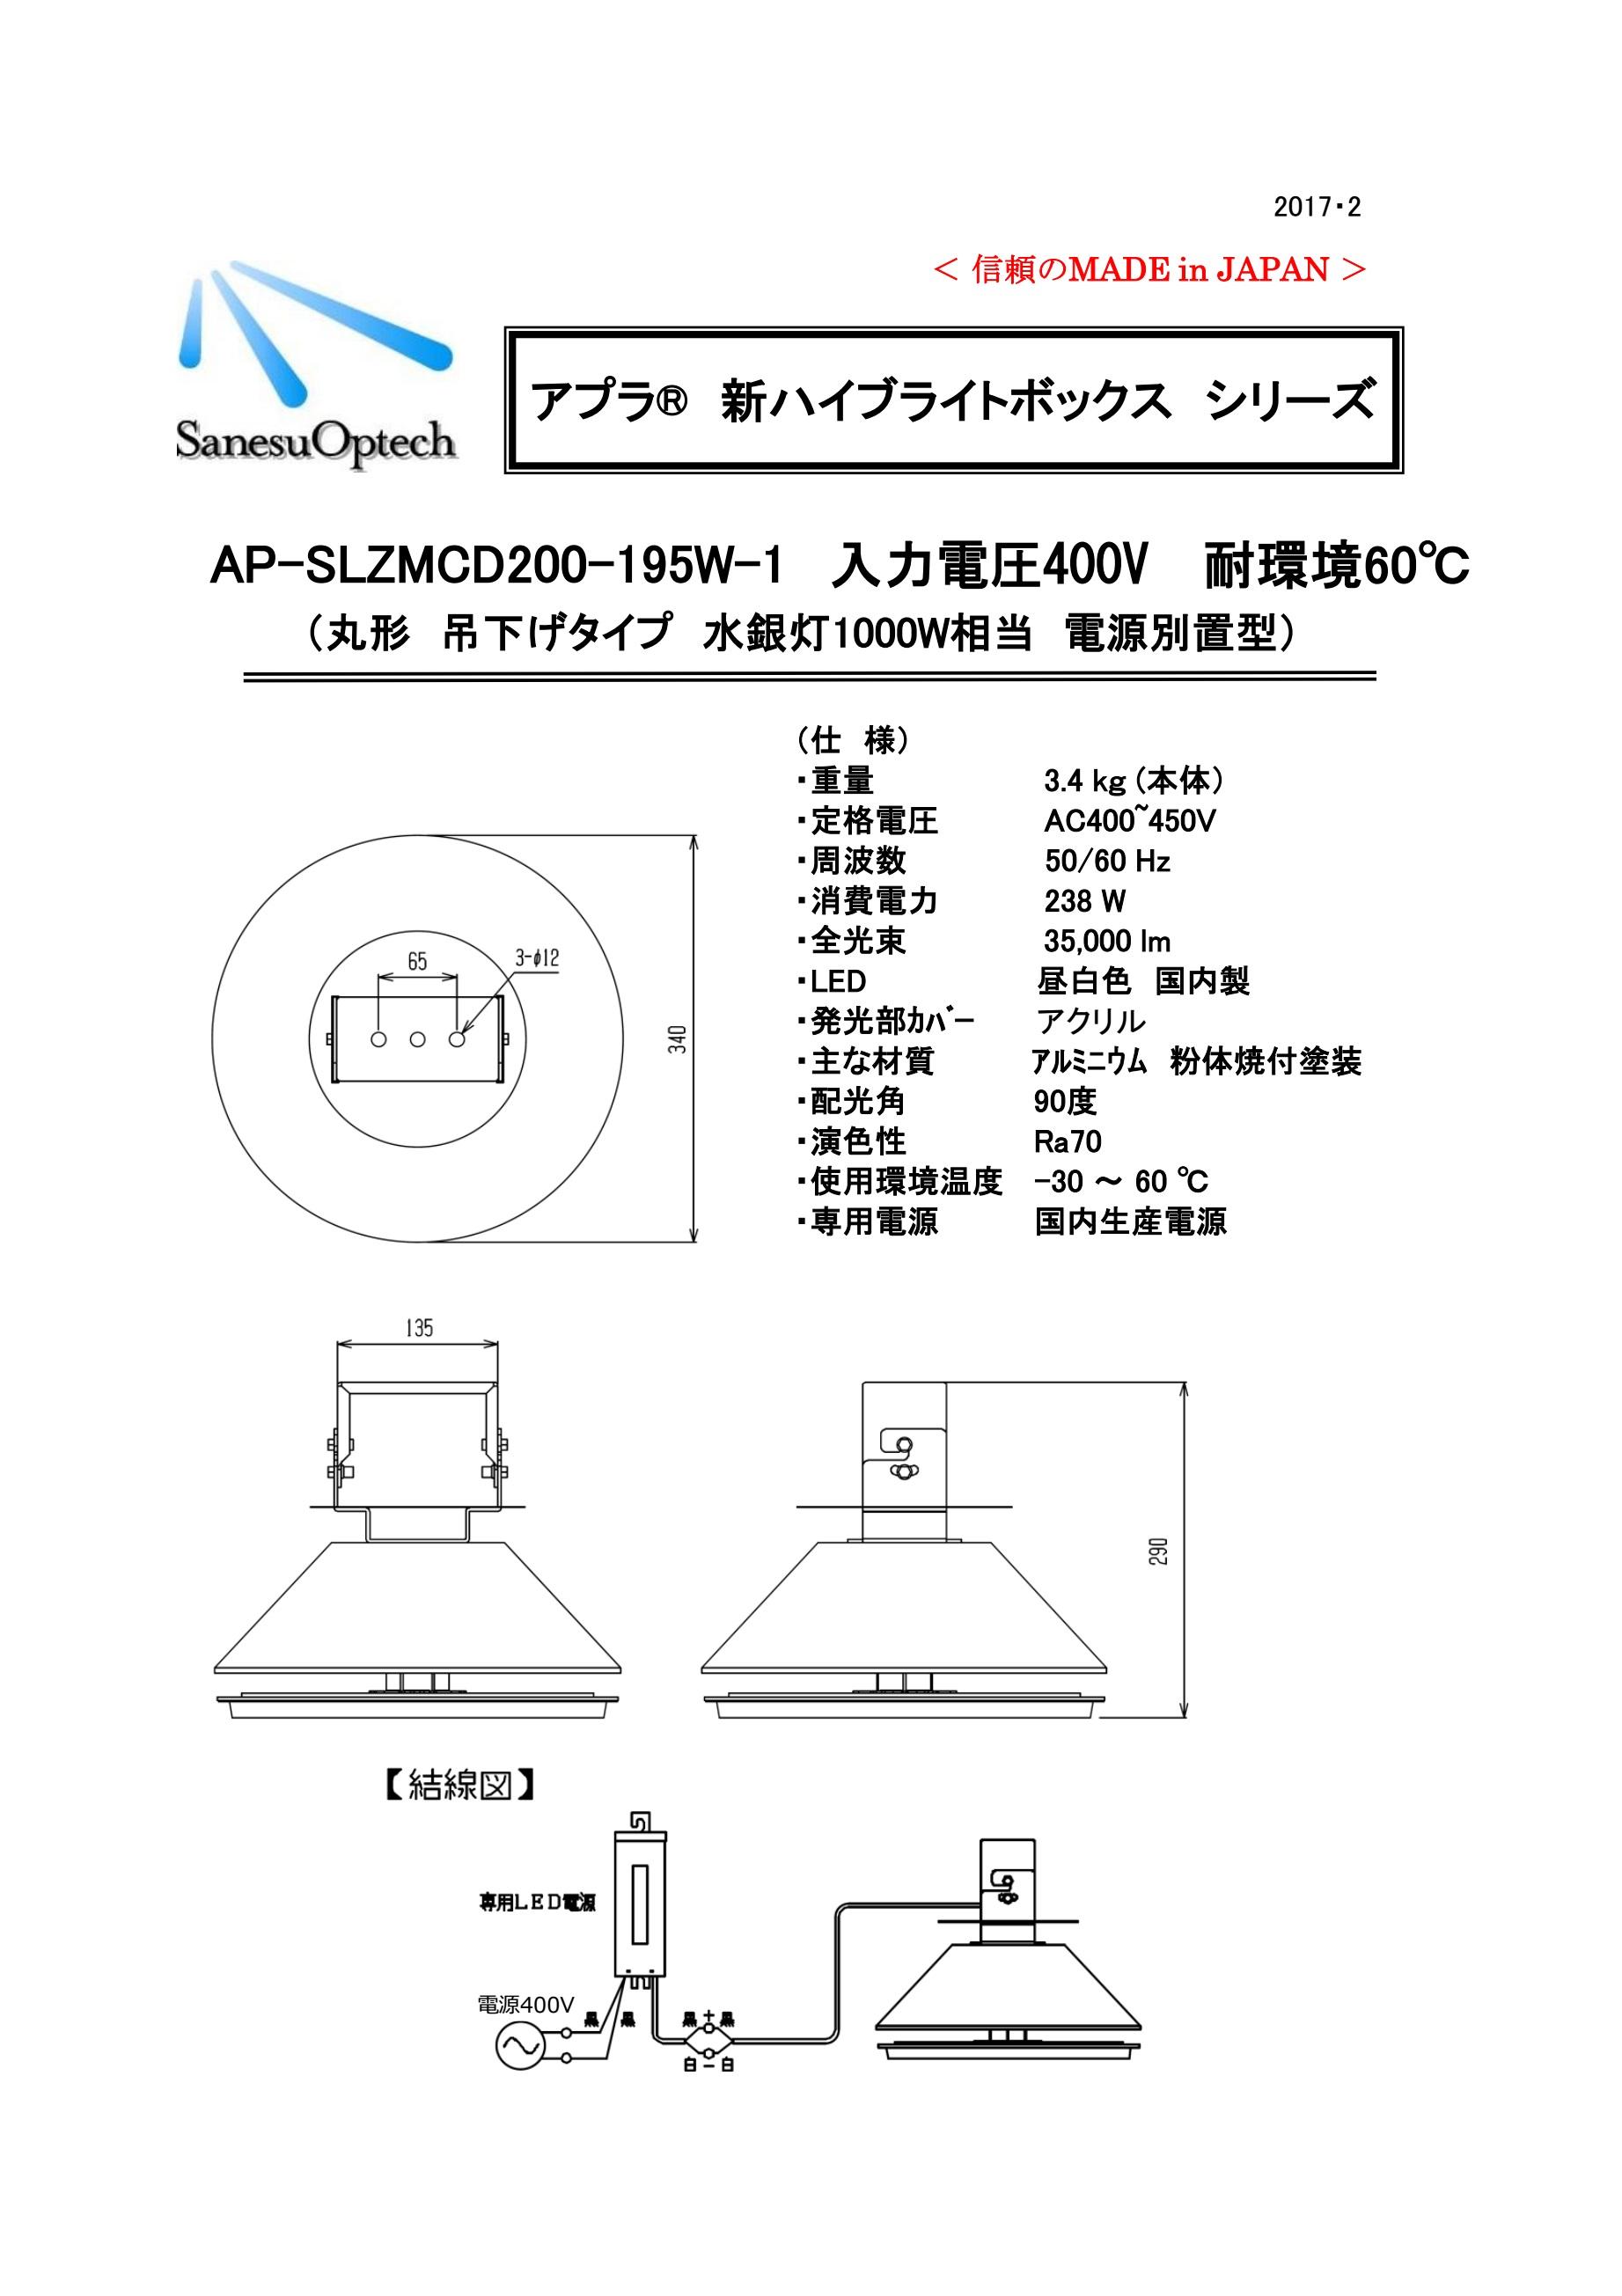 AP-SLZMCD200-195W-1